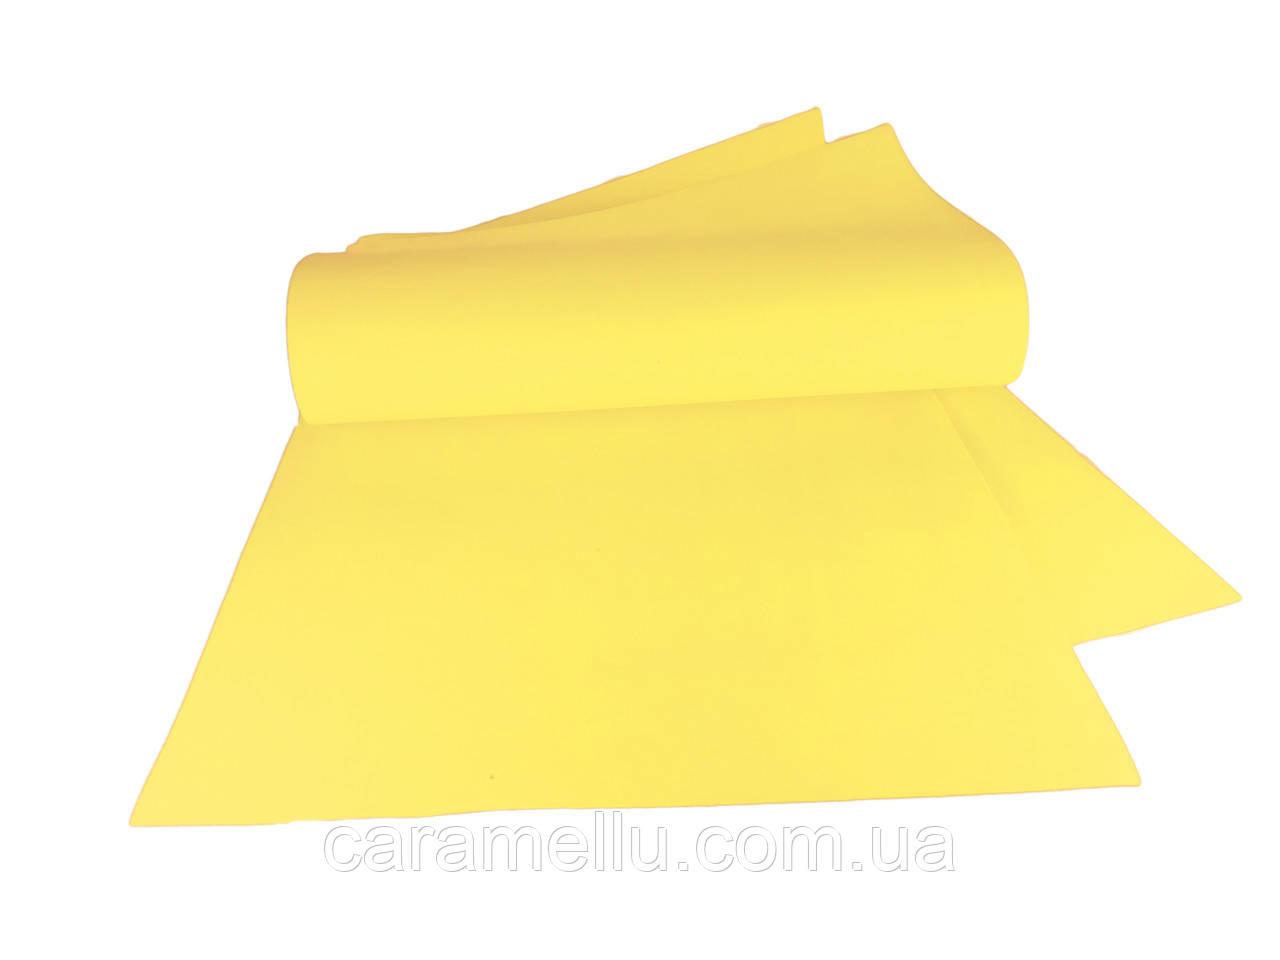 Фоамиран иранский 112, Желтый, 1мм, 70х30см.